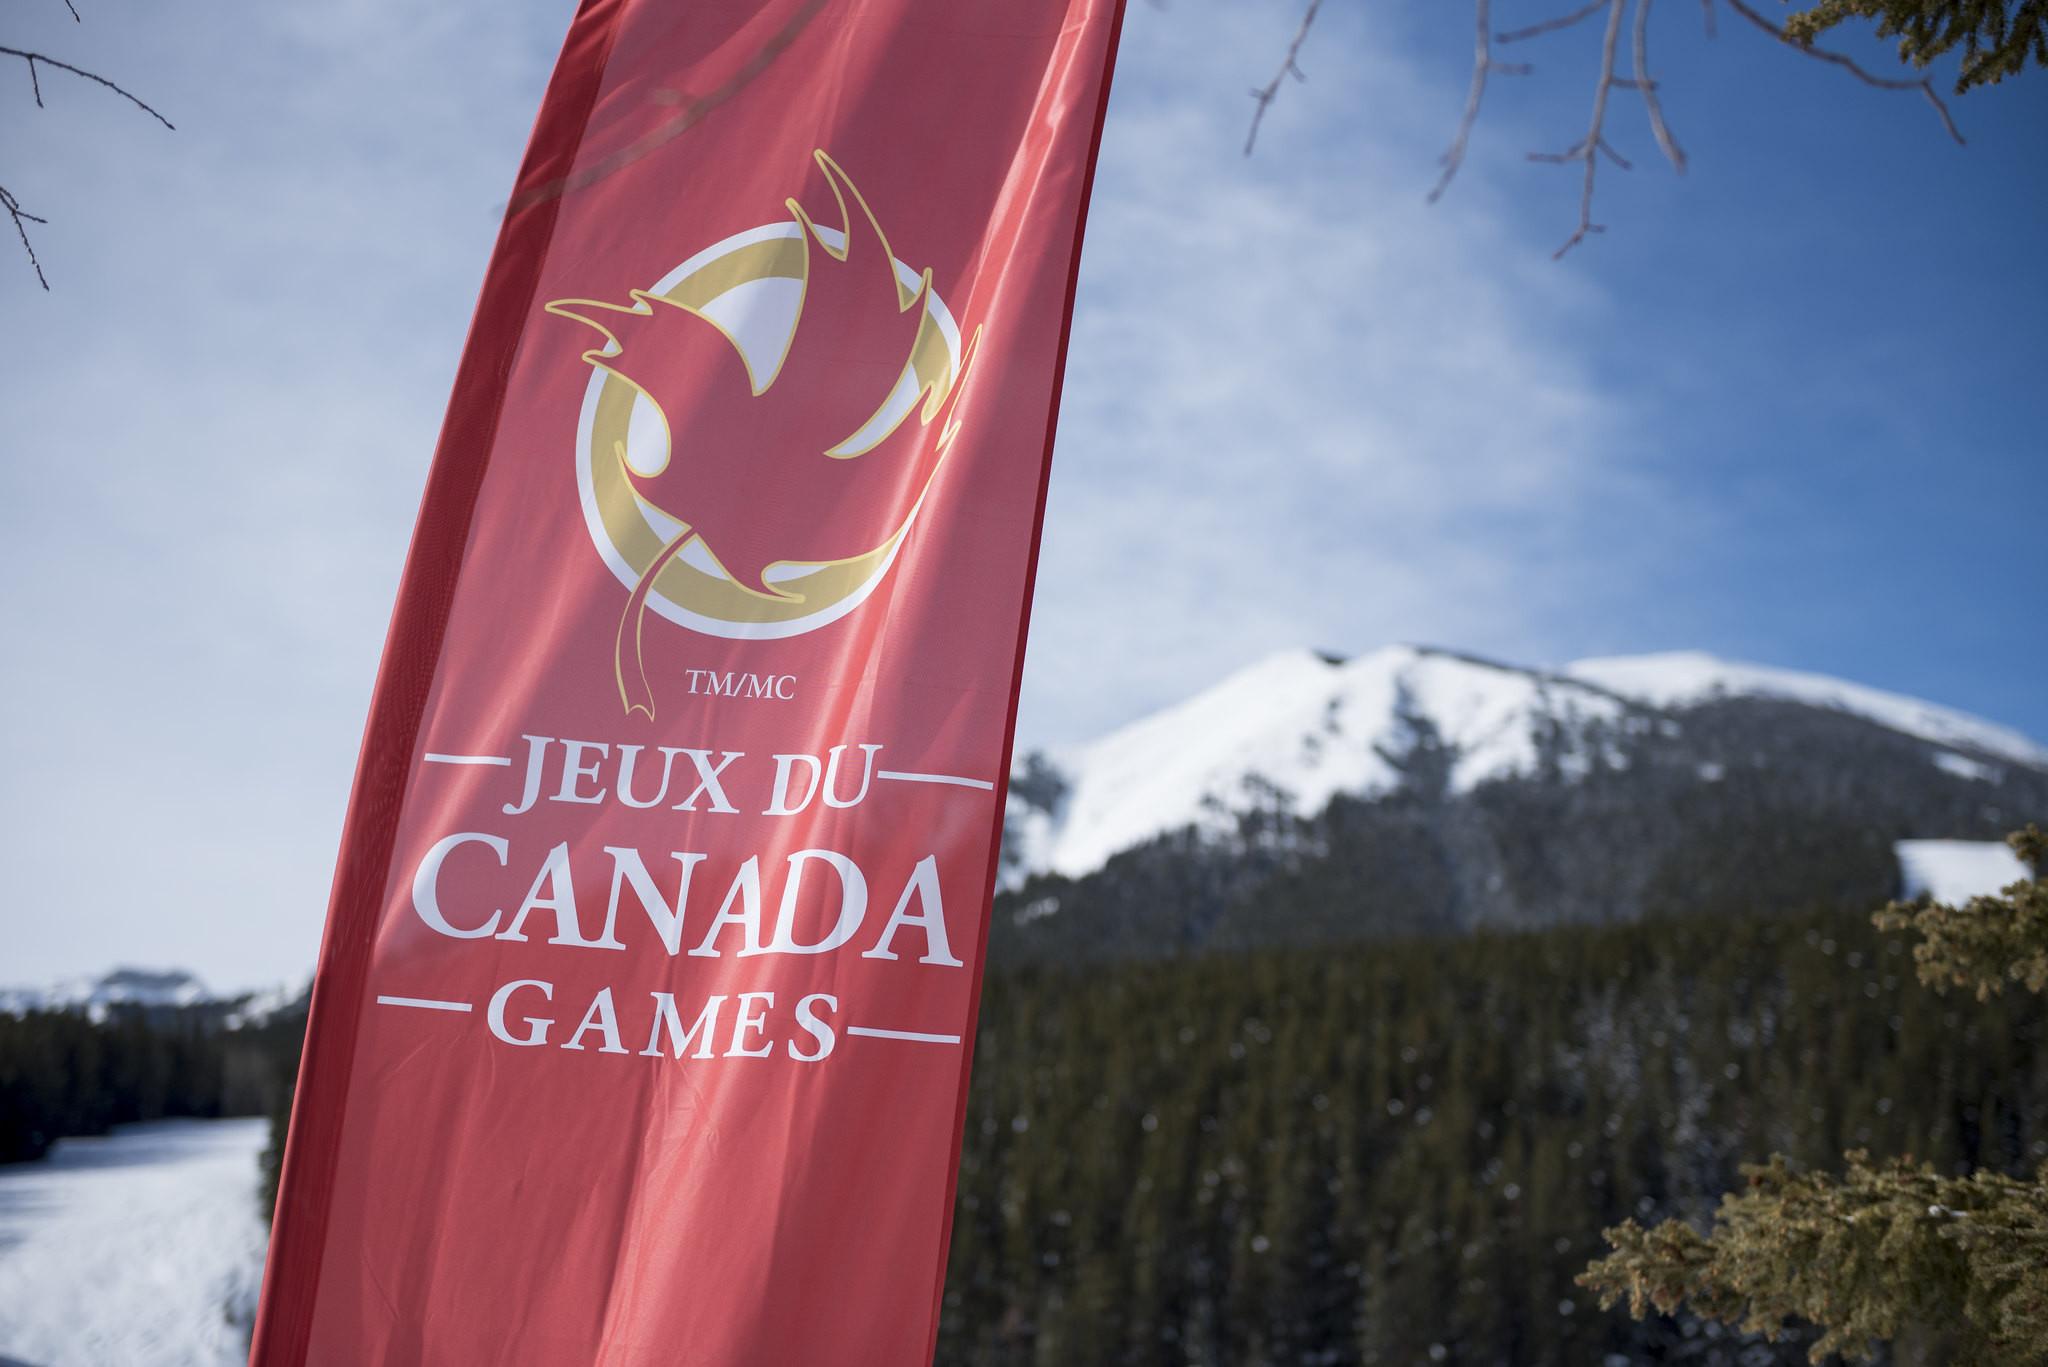 Niagara 2021 Canada Summer Games postponed to 2022 due to COVID-19 pandemic